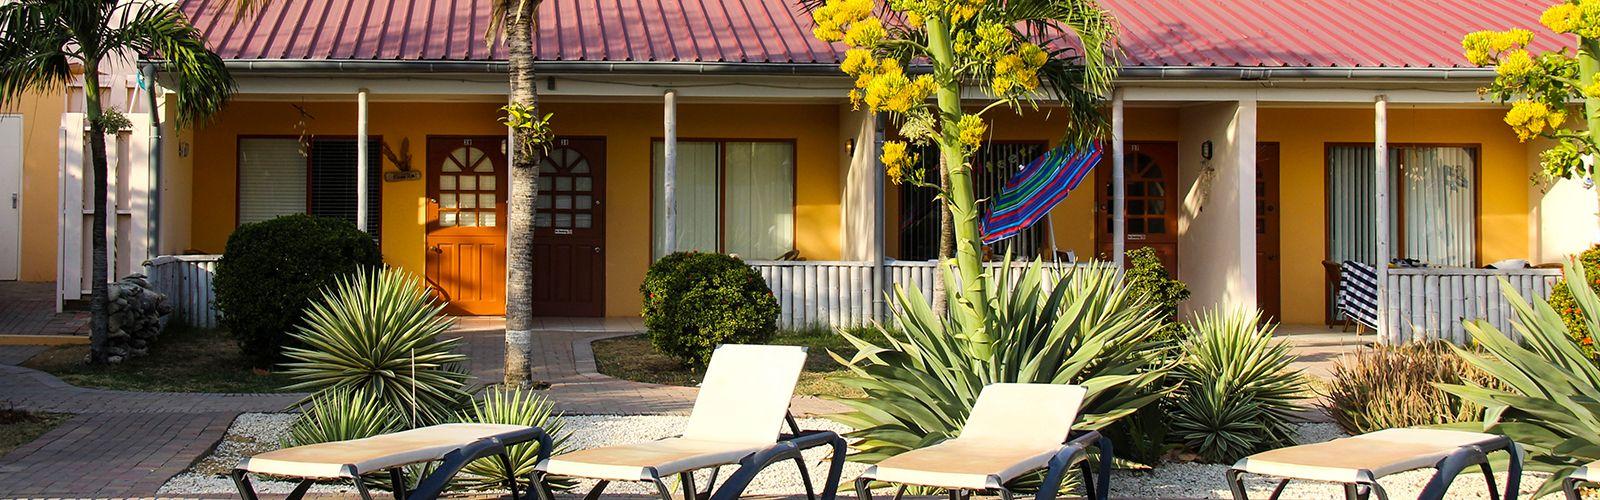 Camacuri Residence & Apartments Aruba - Aruba Vacation Rentals